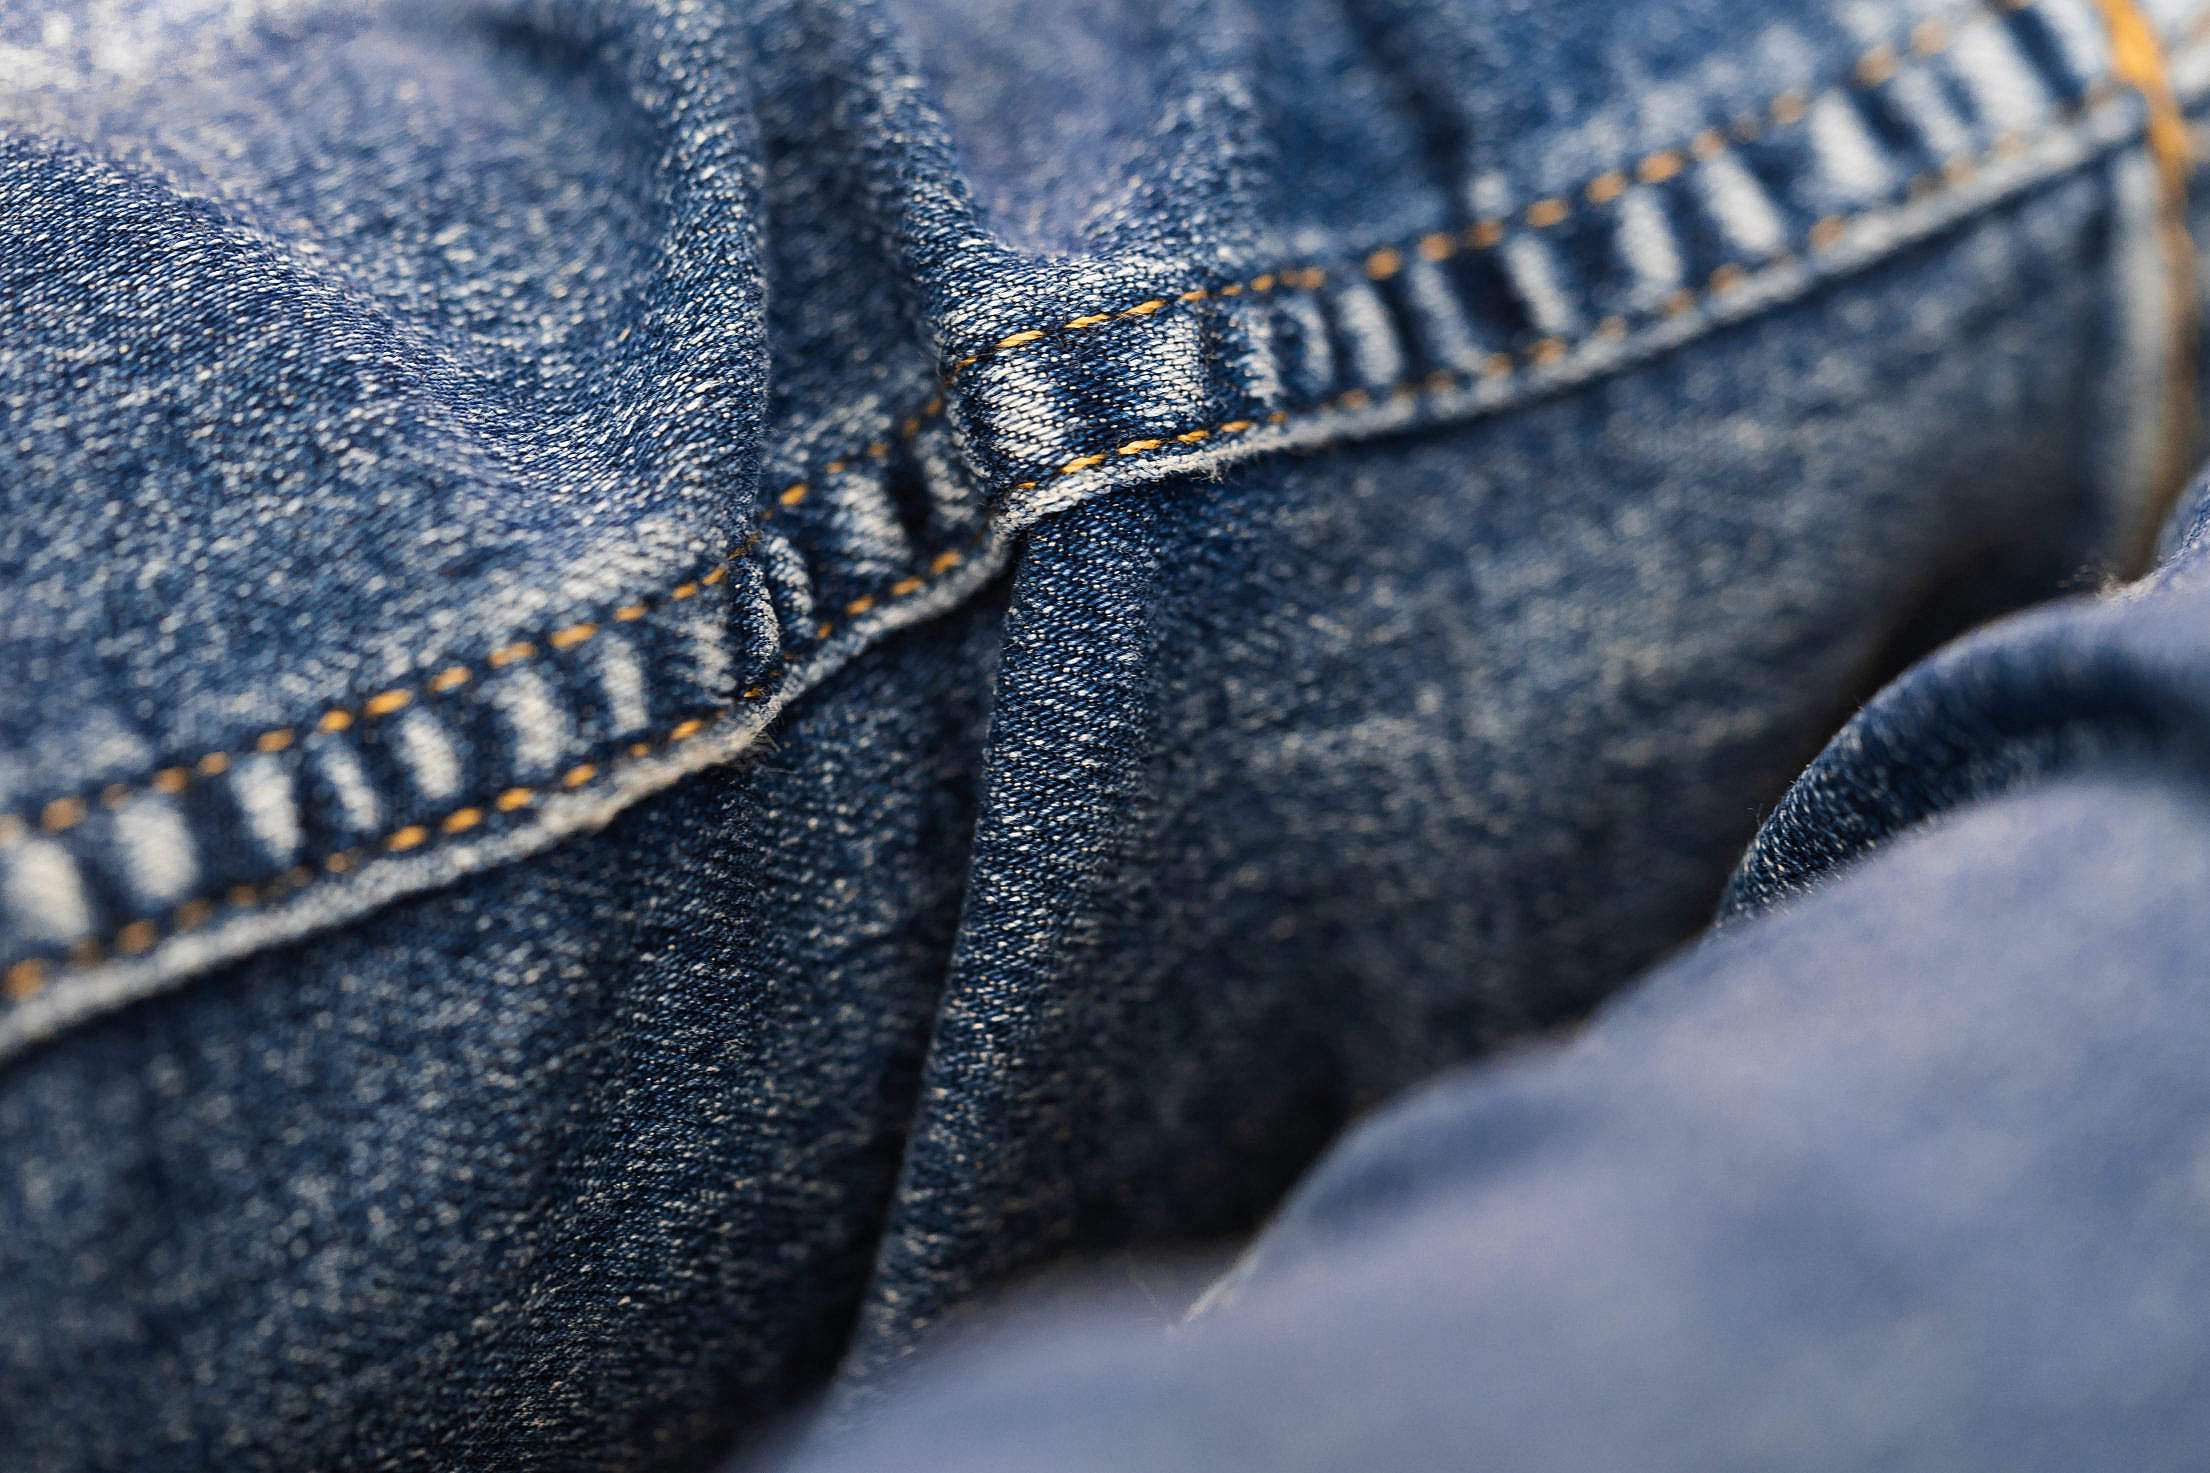 Blue Denim Jeans Texture Free Stock Photo